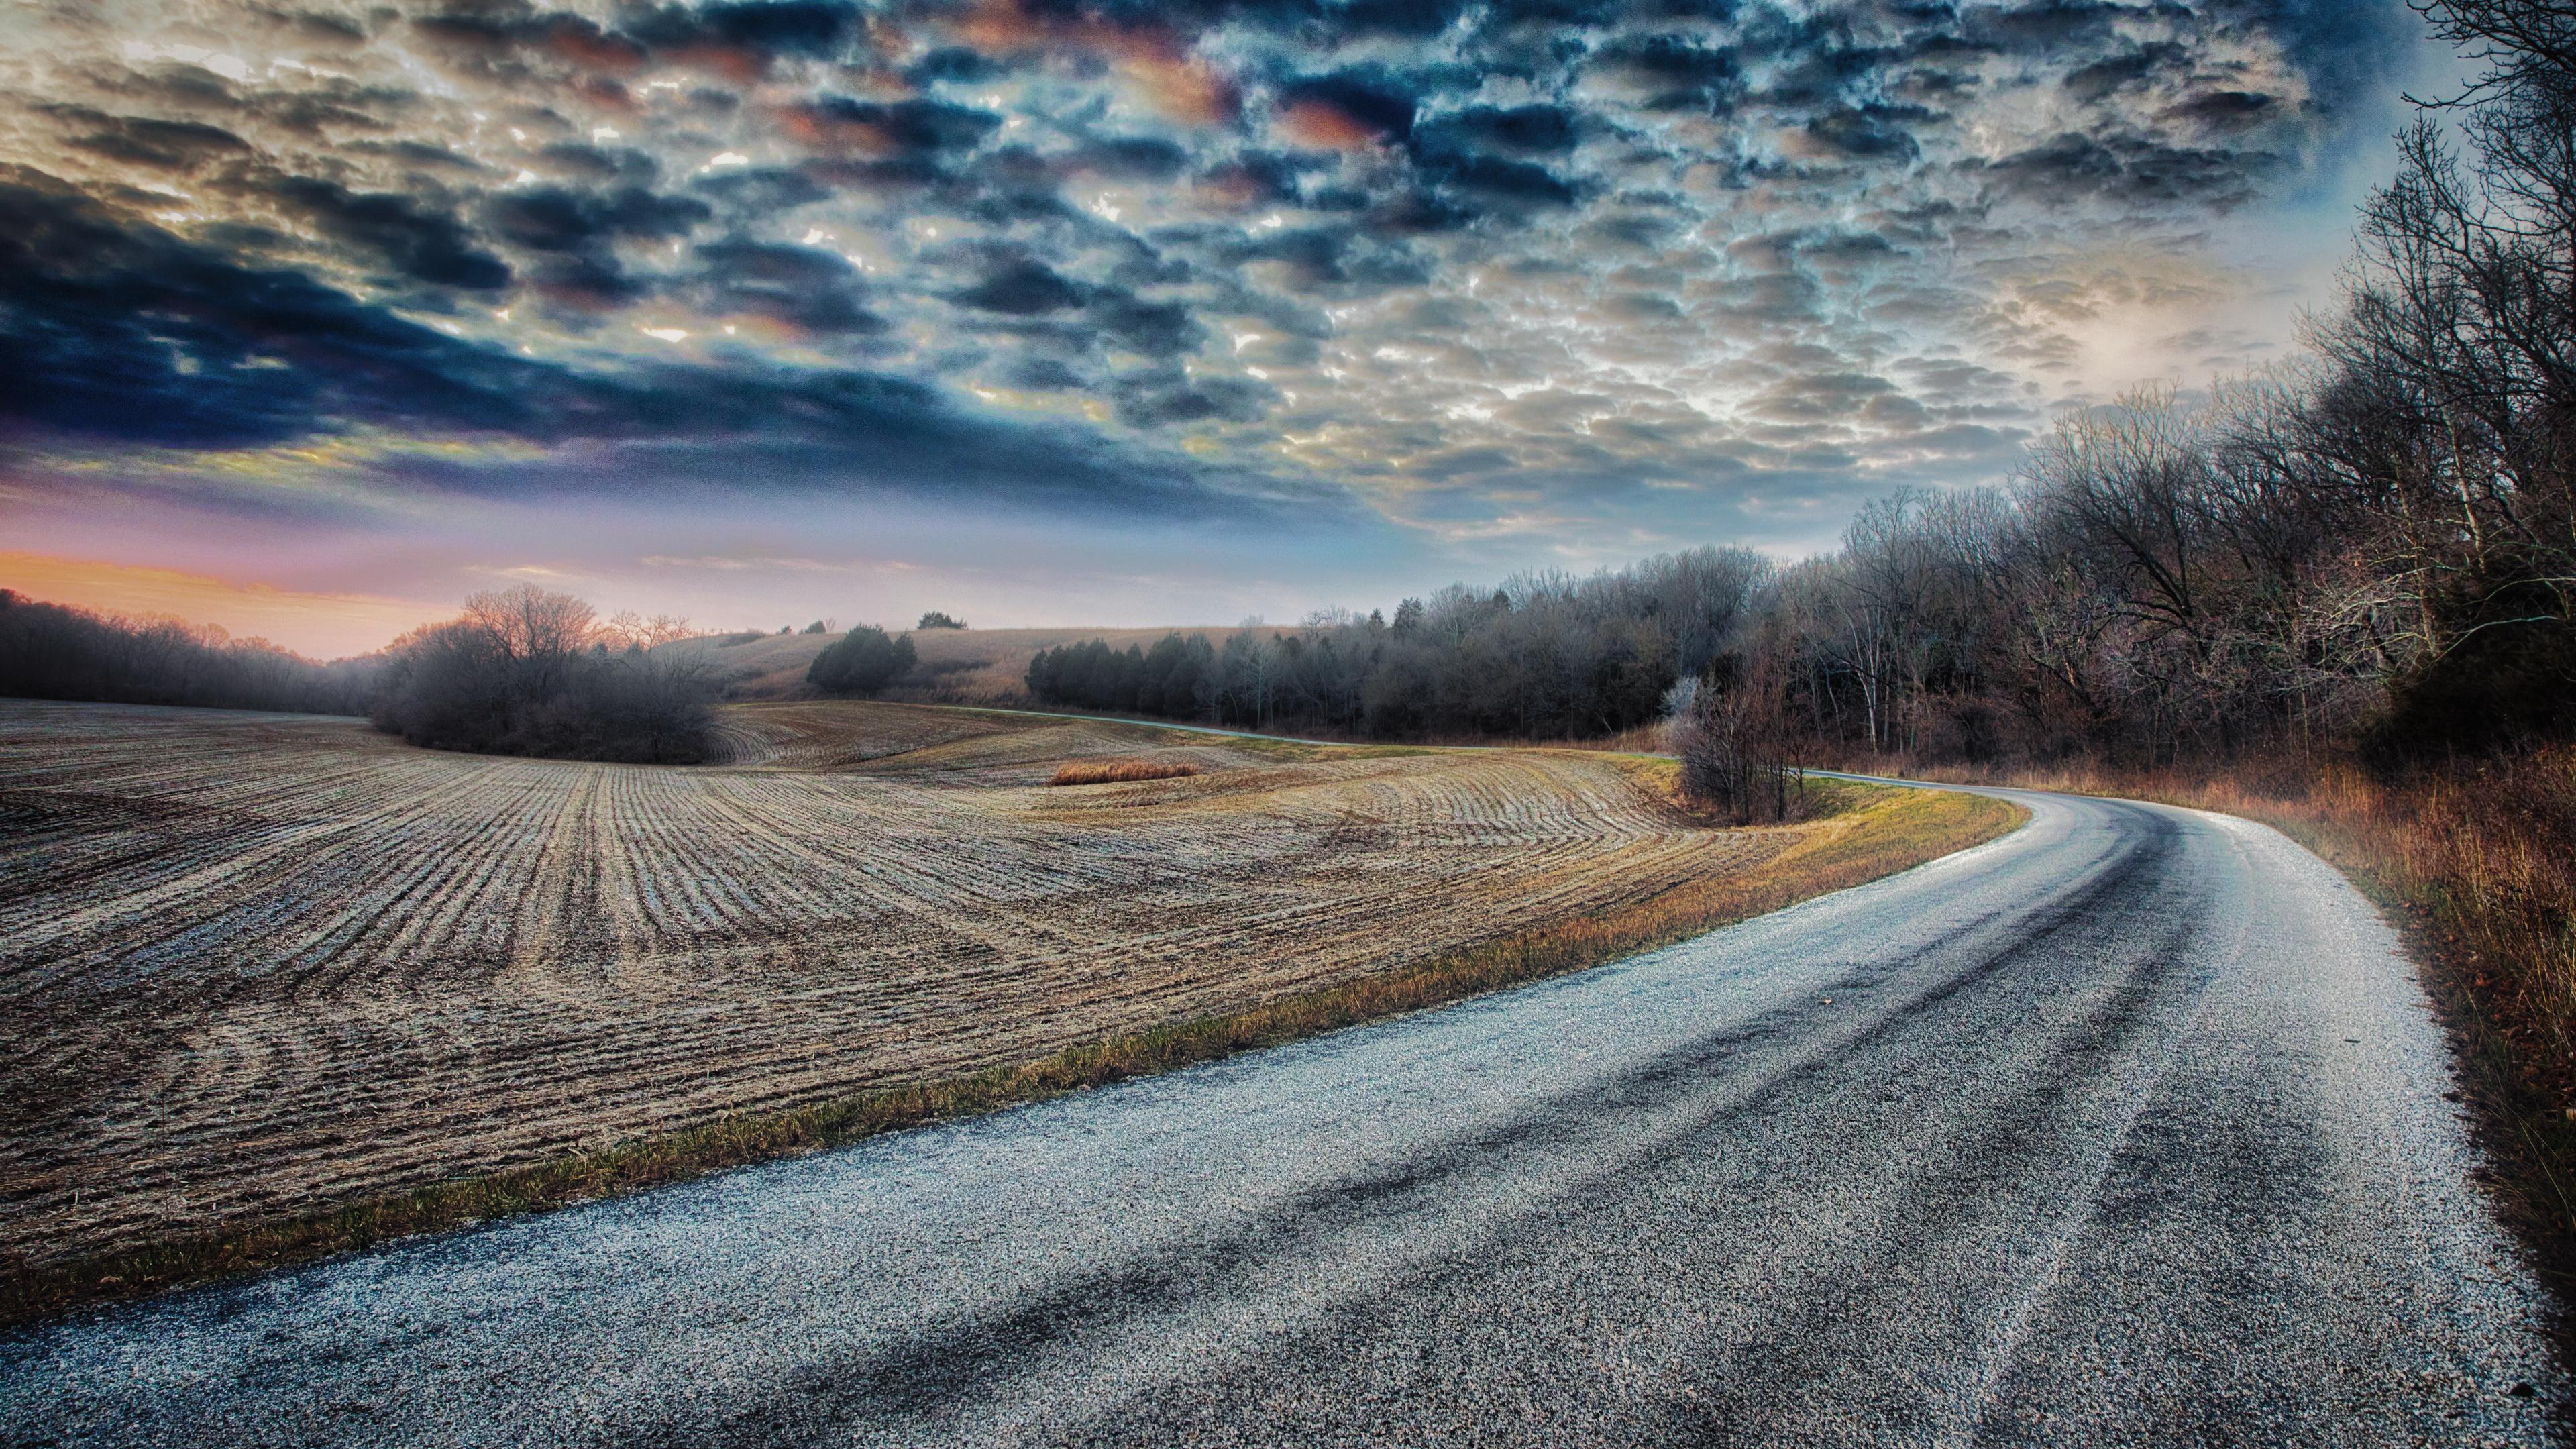 Field Road Sky 3840x2160